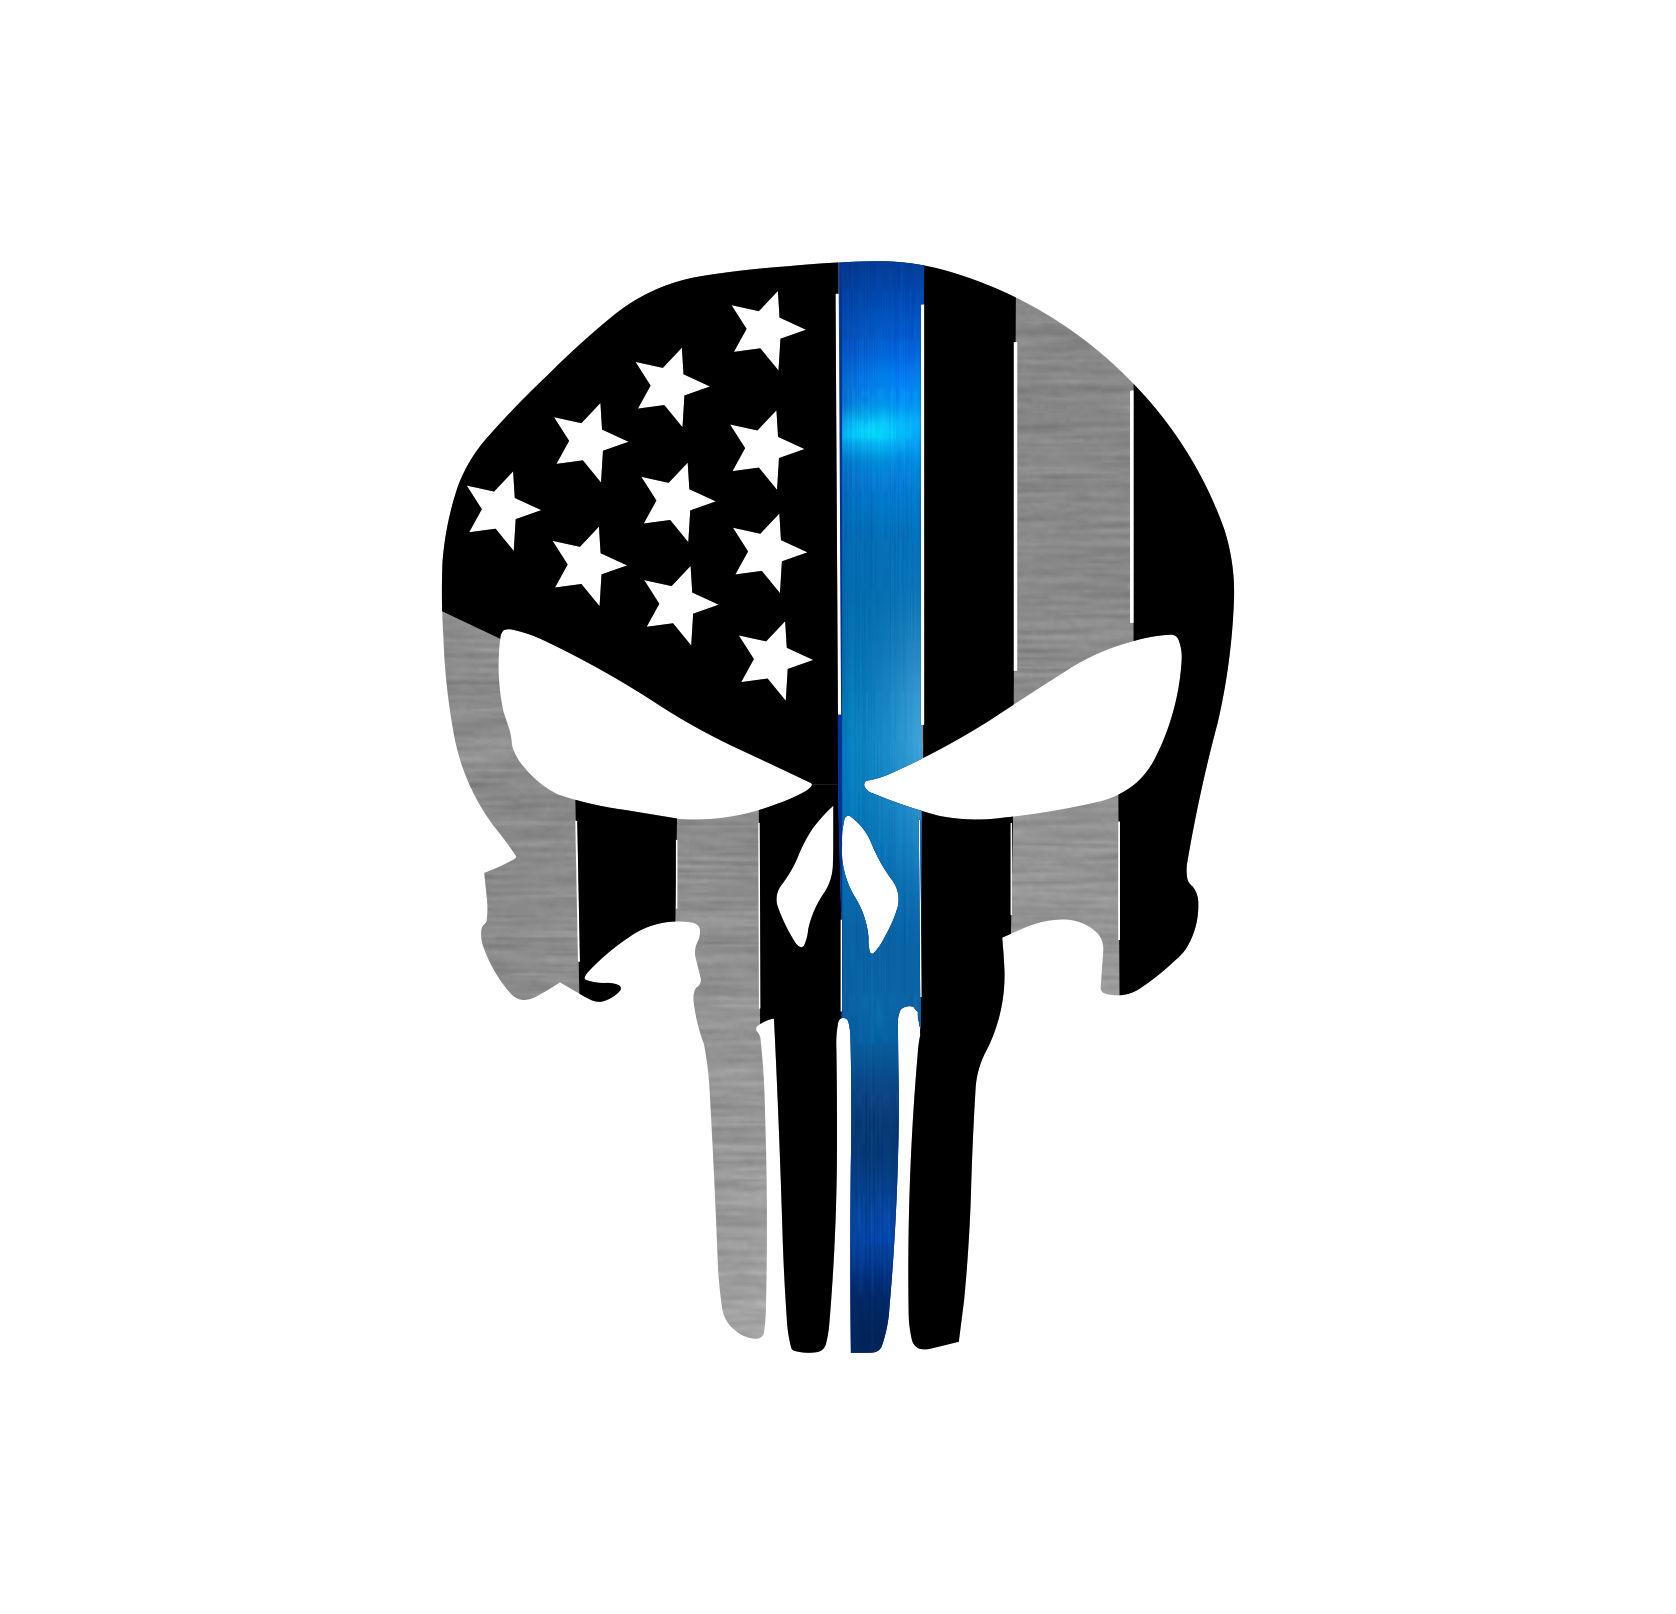 Precision Metal Art Punisher Symbol Steel Laser Cut Wall ...